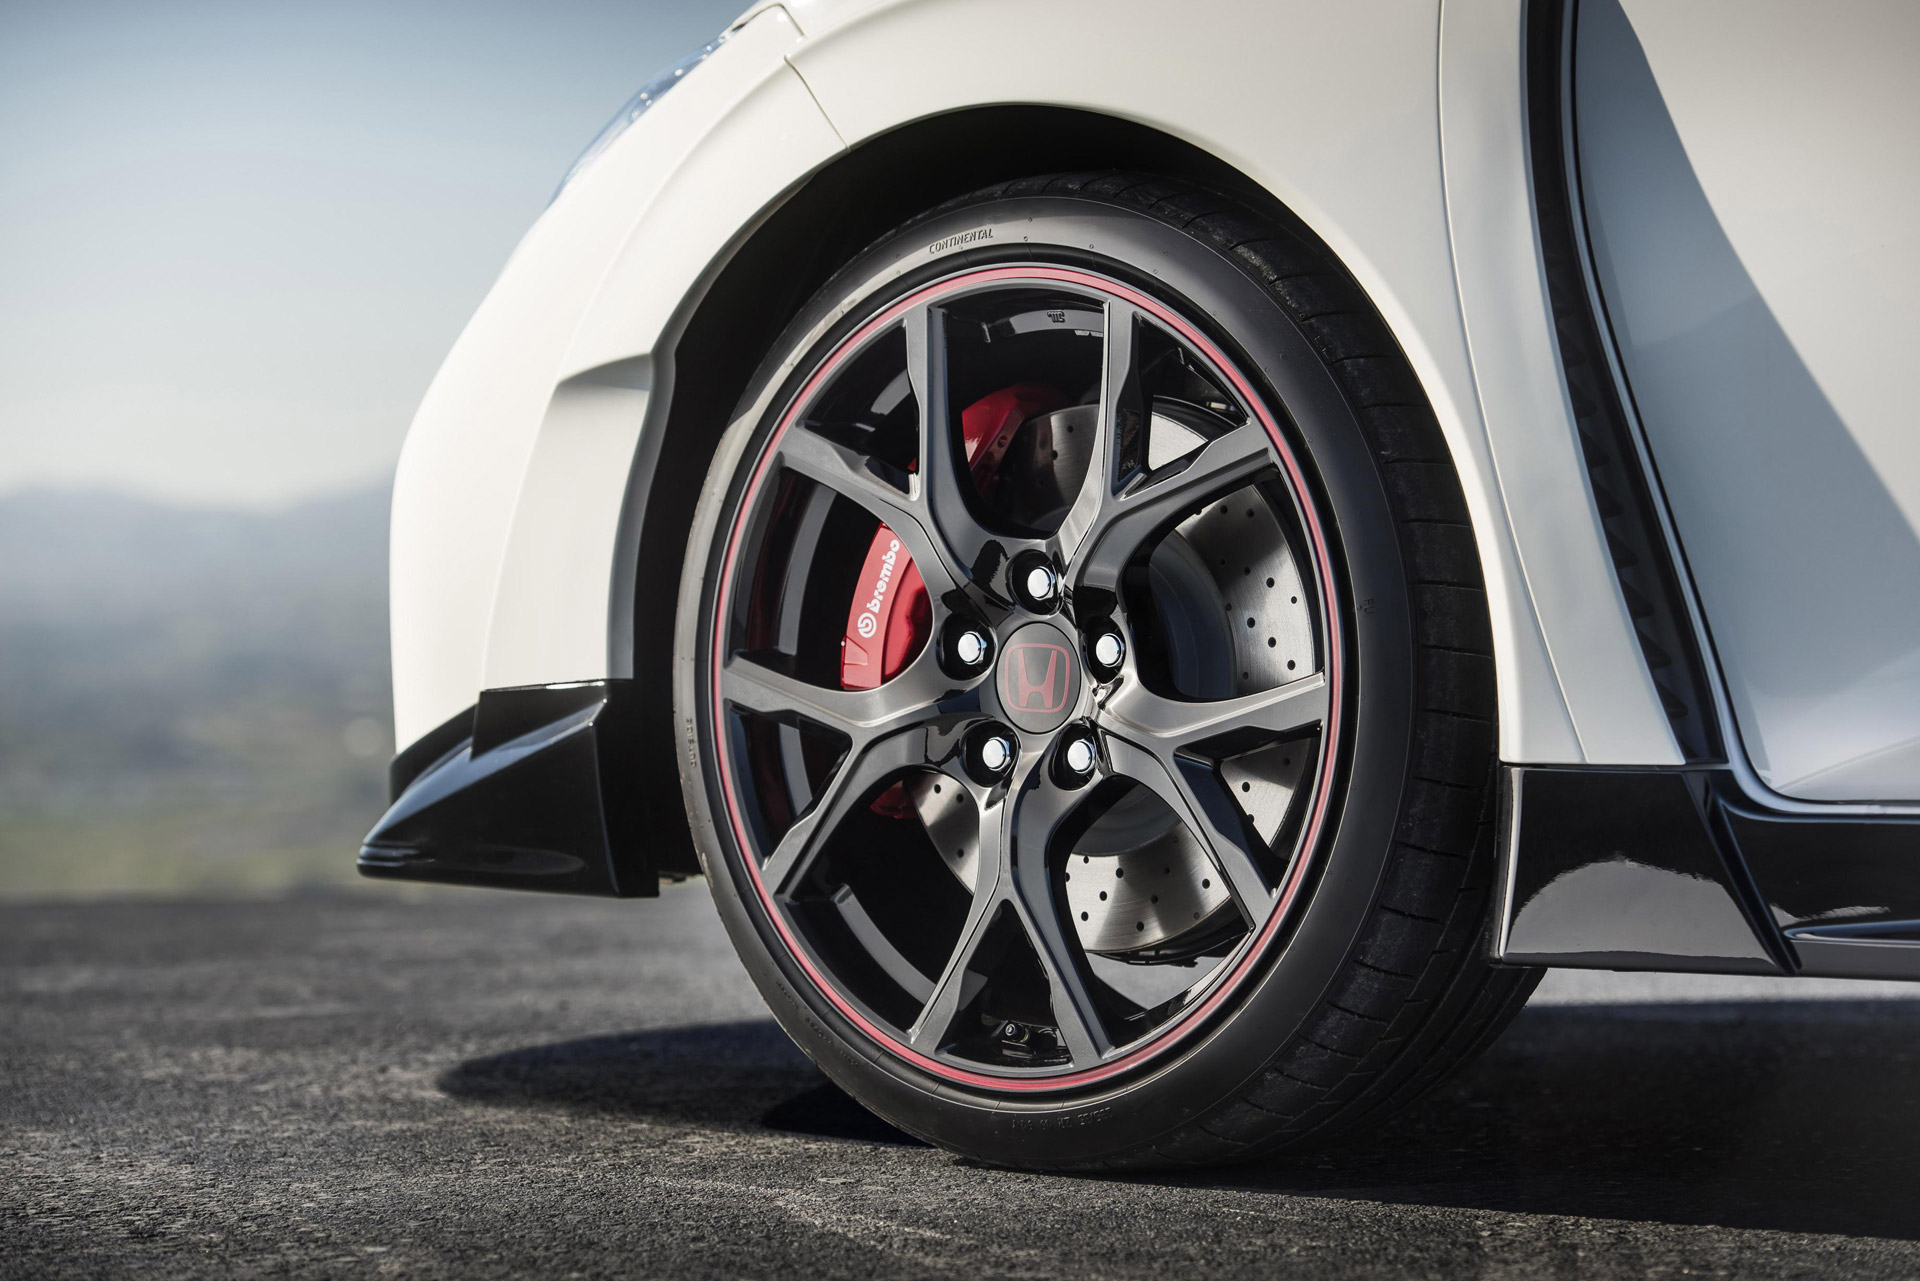 2015 Honda Civic Type R Clocked At 167 MPH